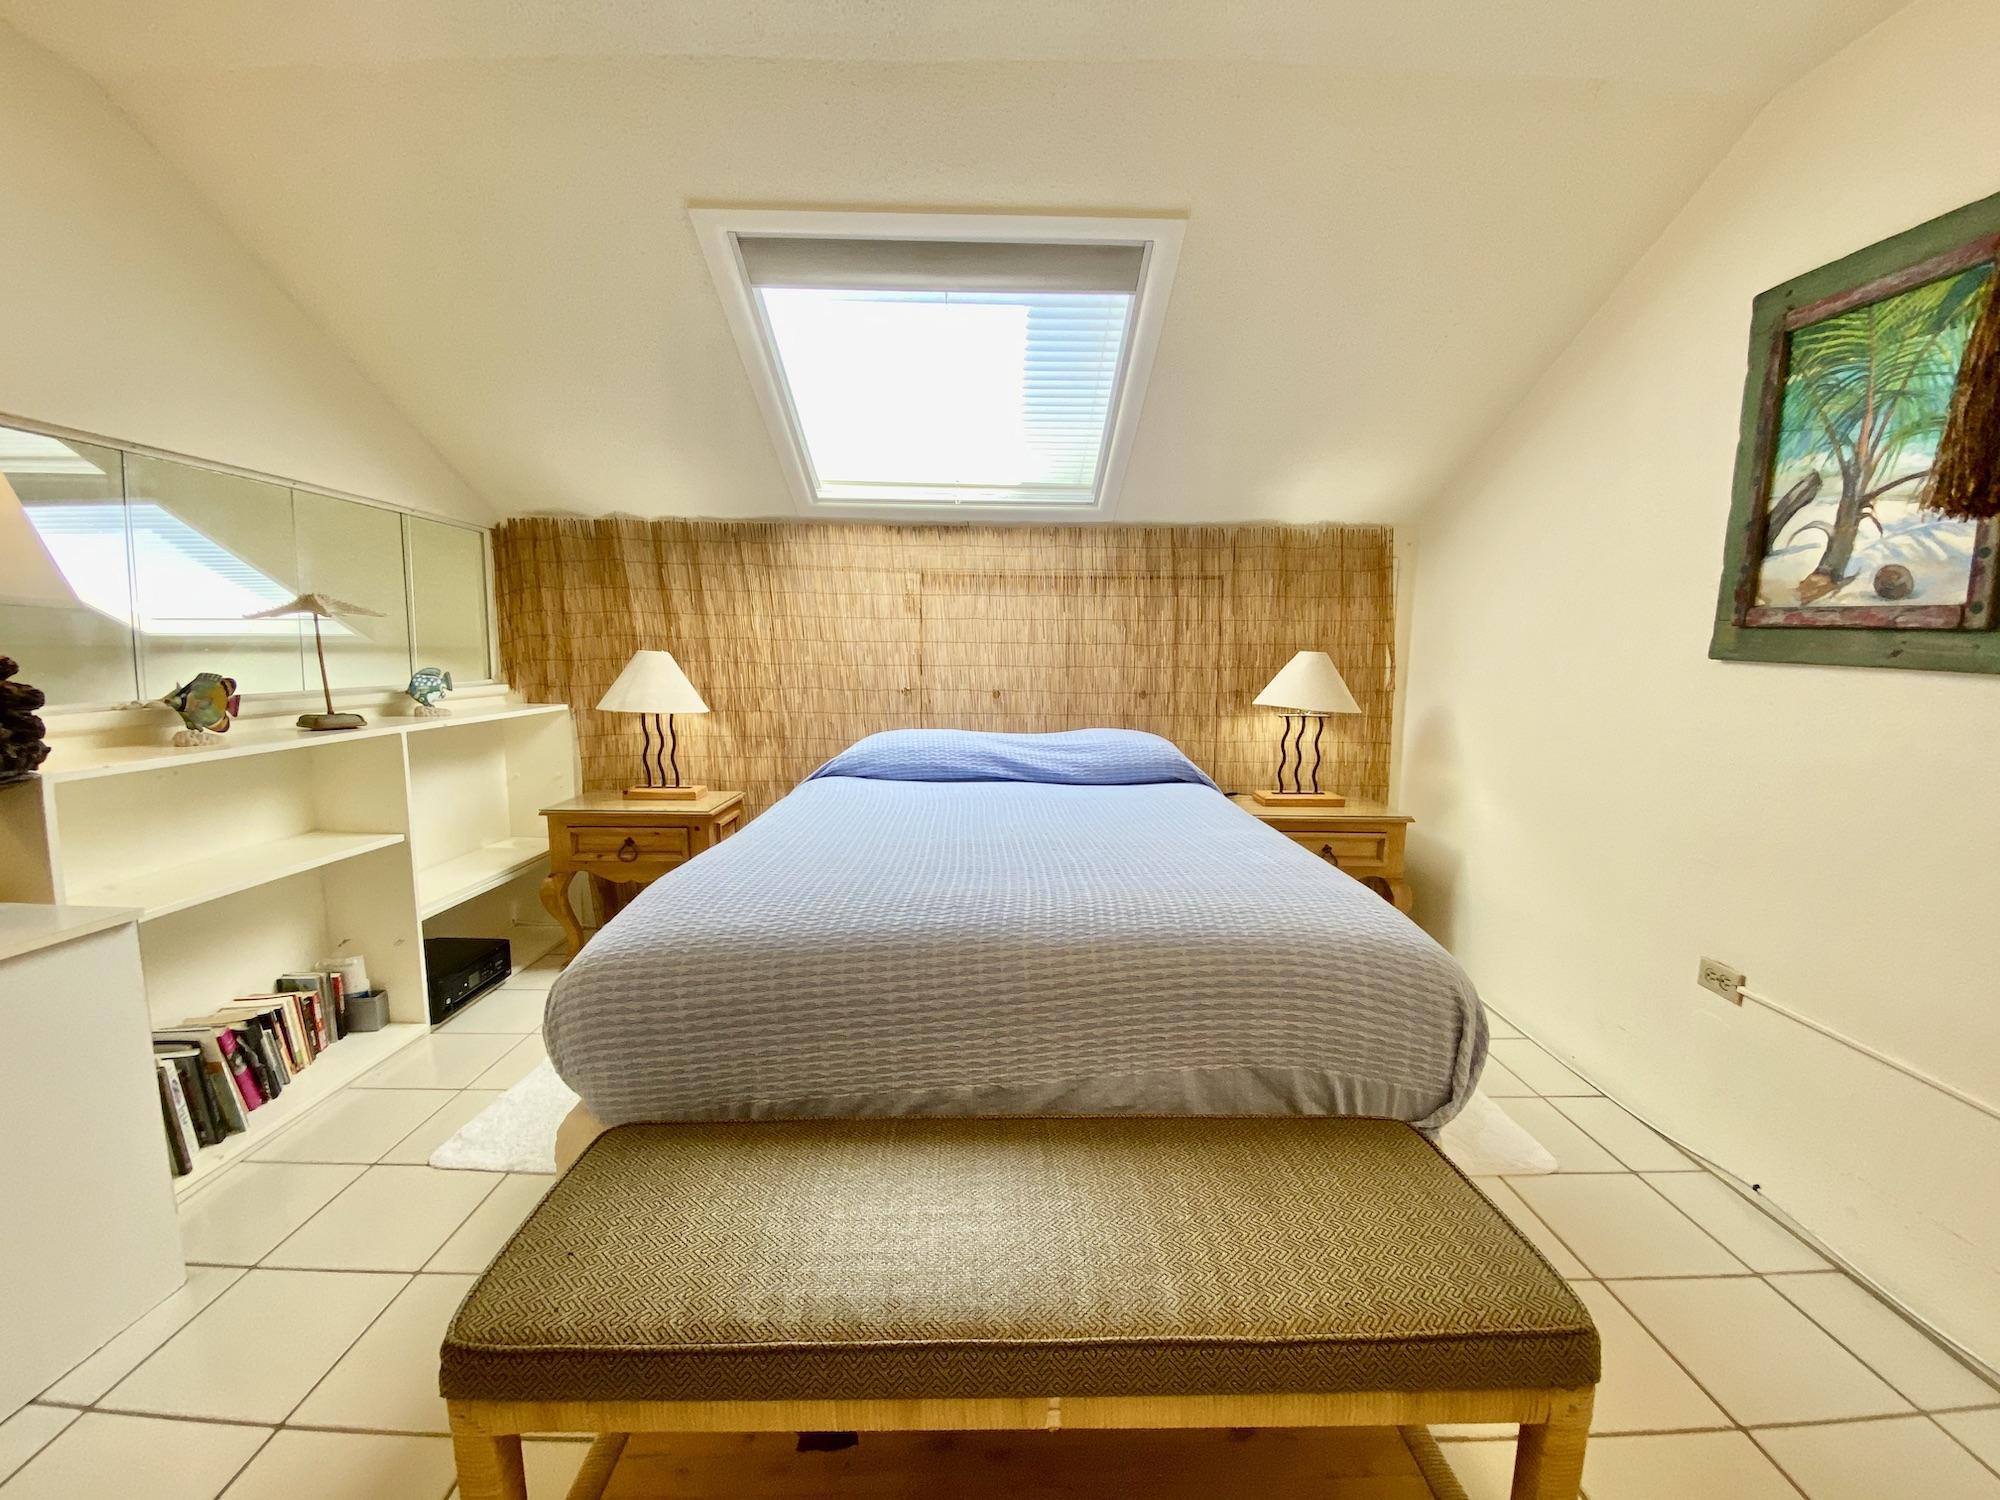 Loft Bed 1 with skylight